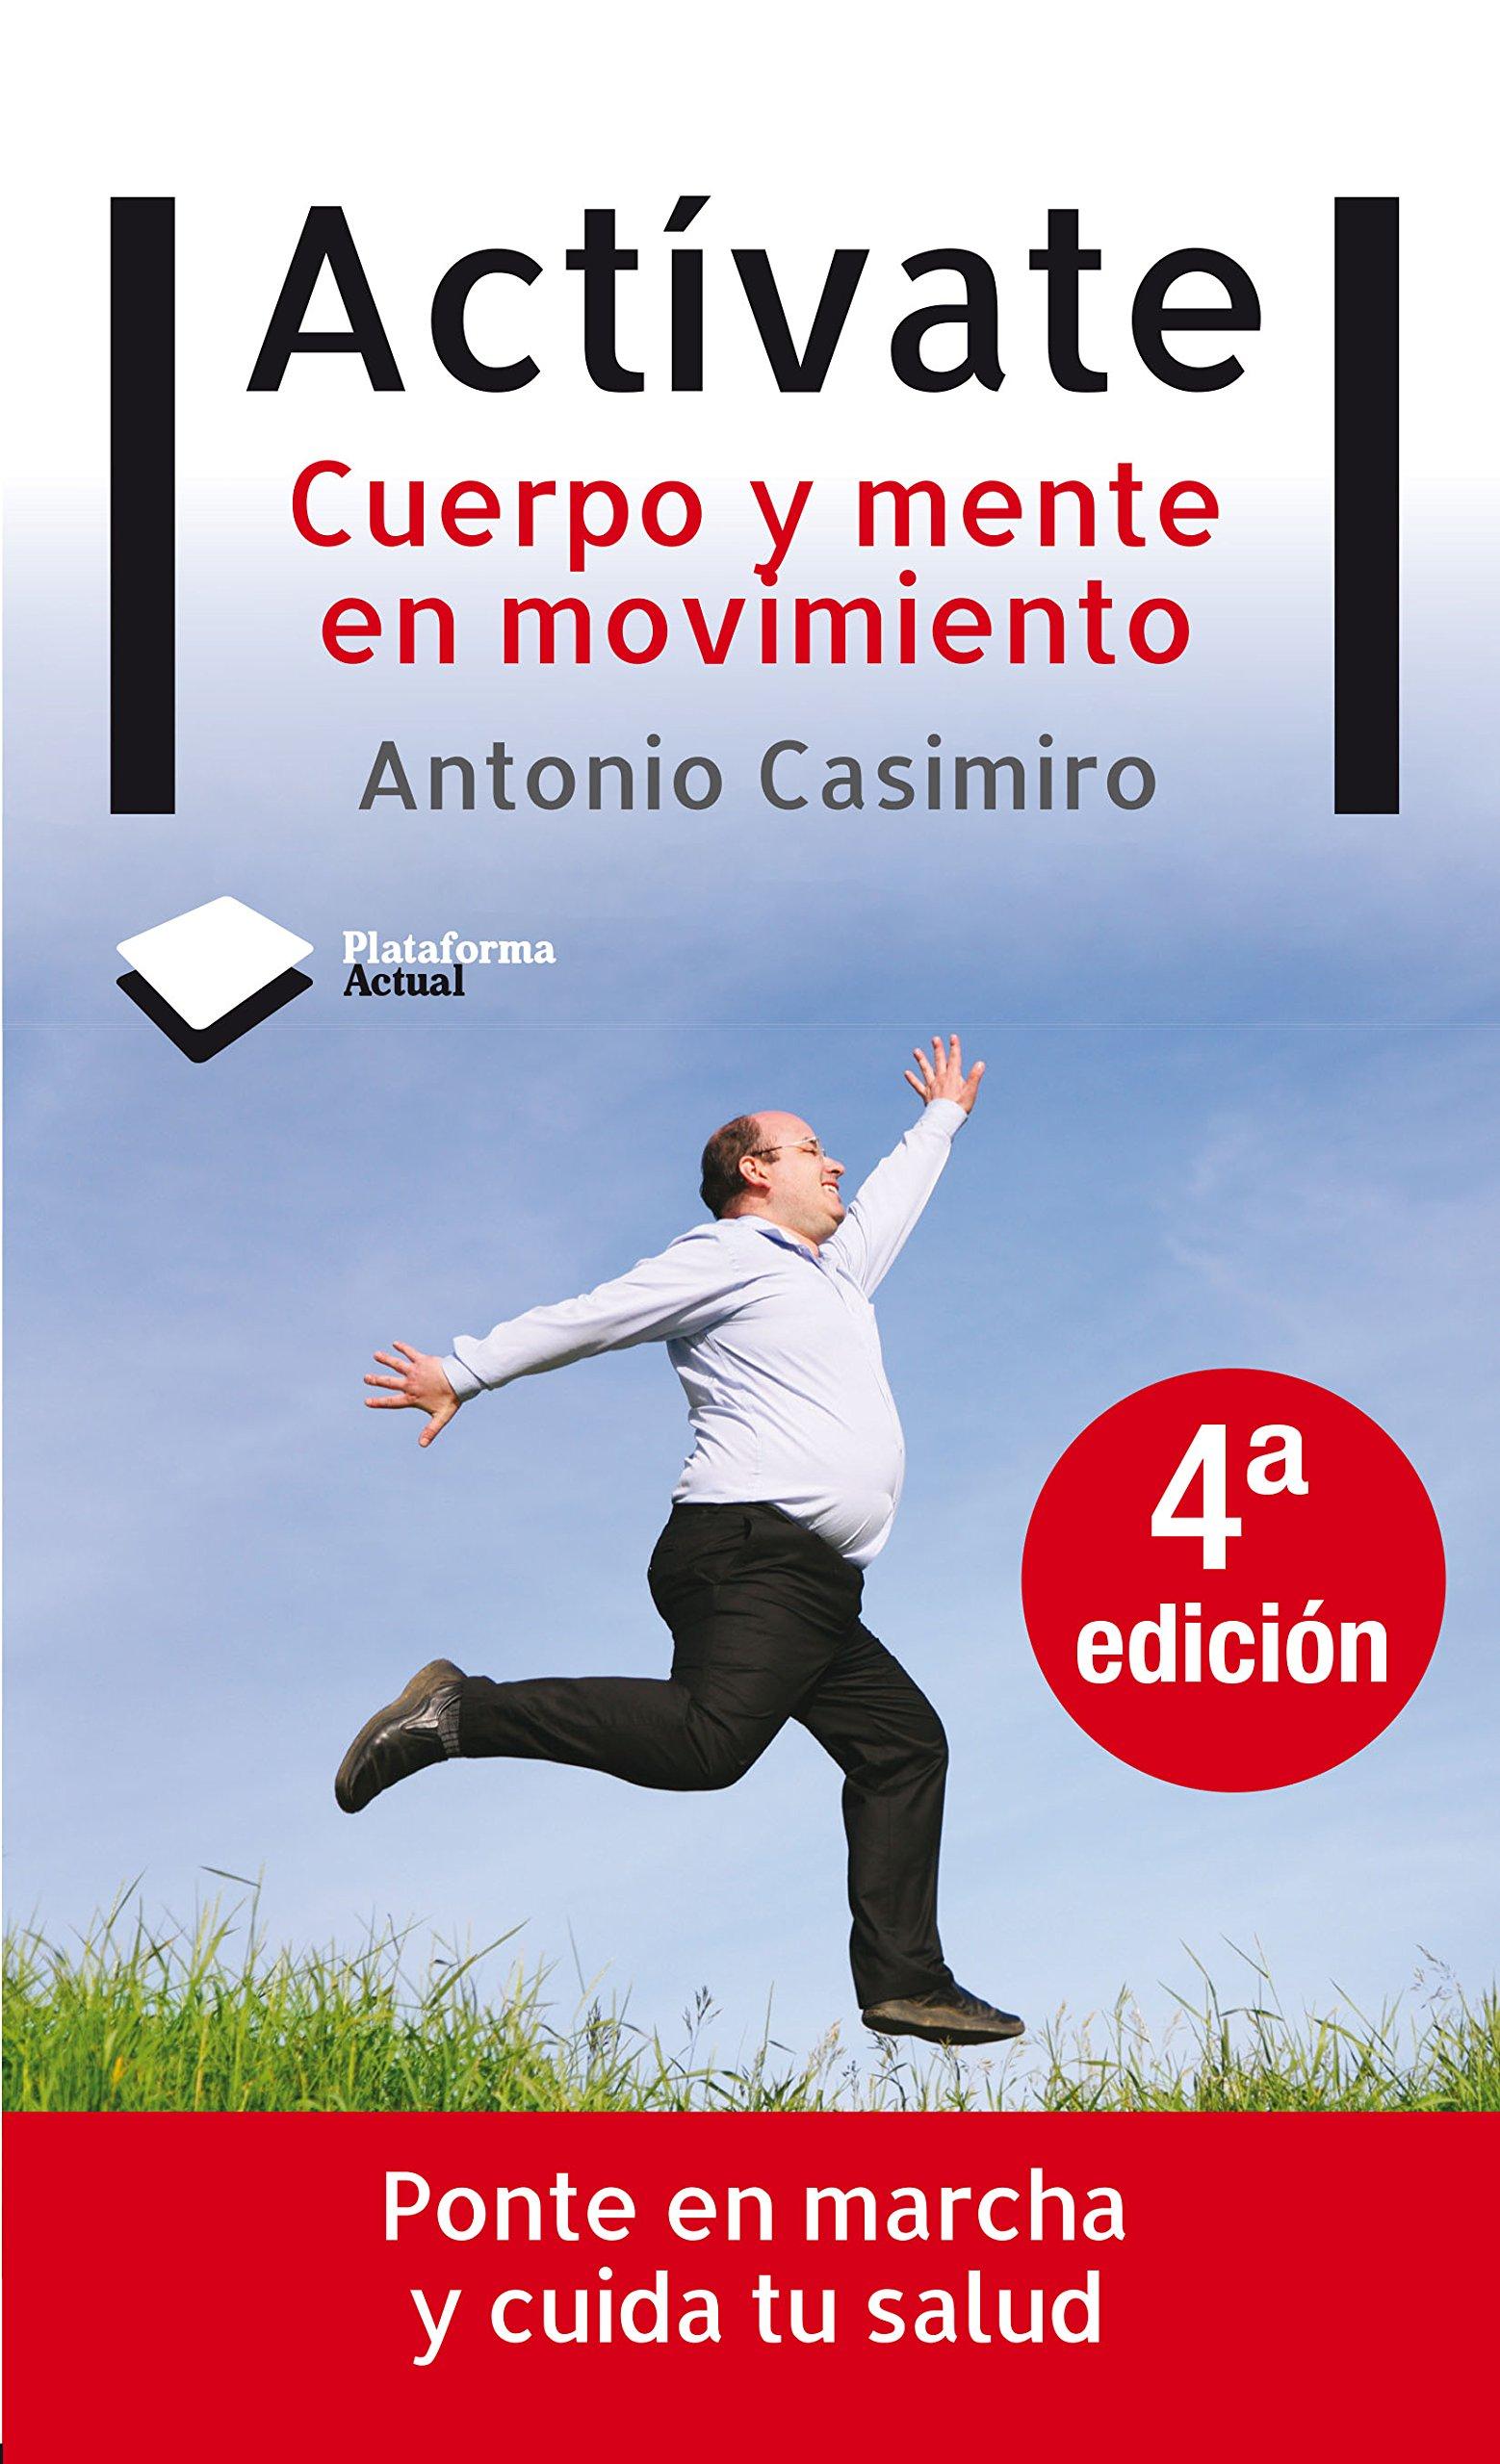 Activate (Actual) Tapa blanda – 28 abr 2010 Antonio Casimiro Andújar Plataforma Editorial 8496981924 Exercise